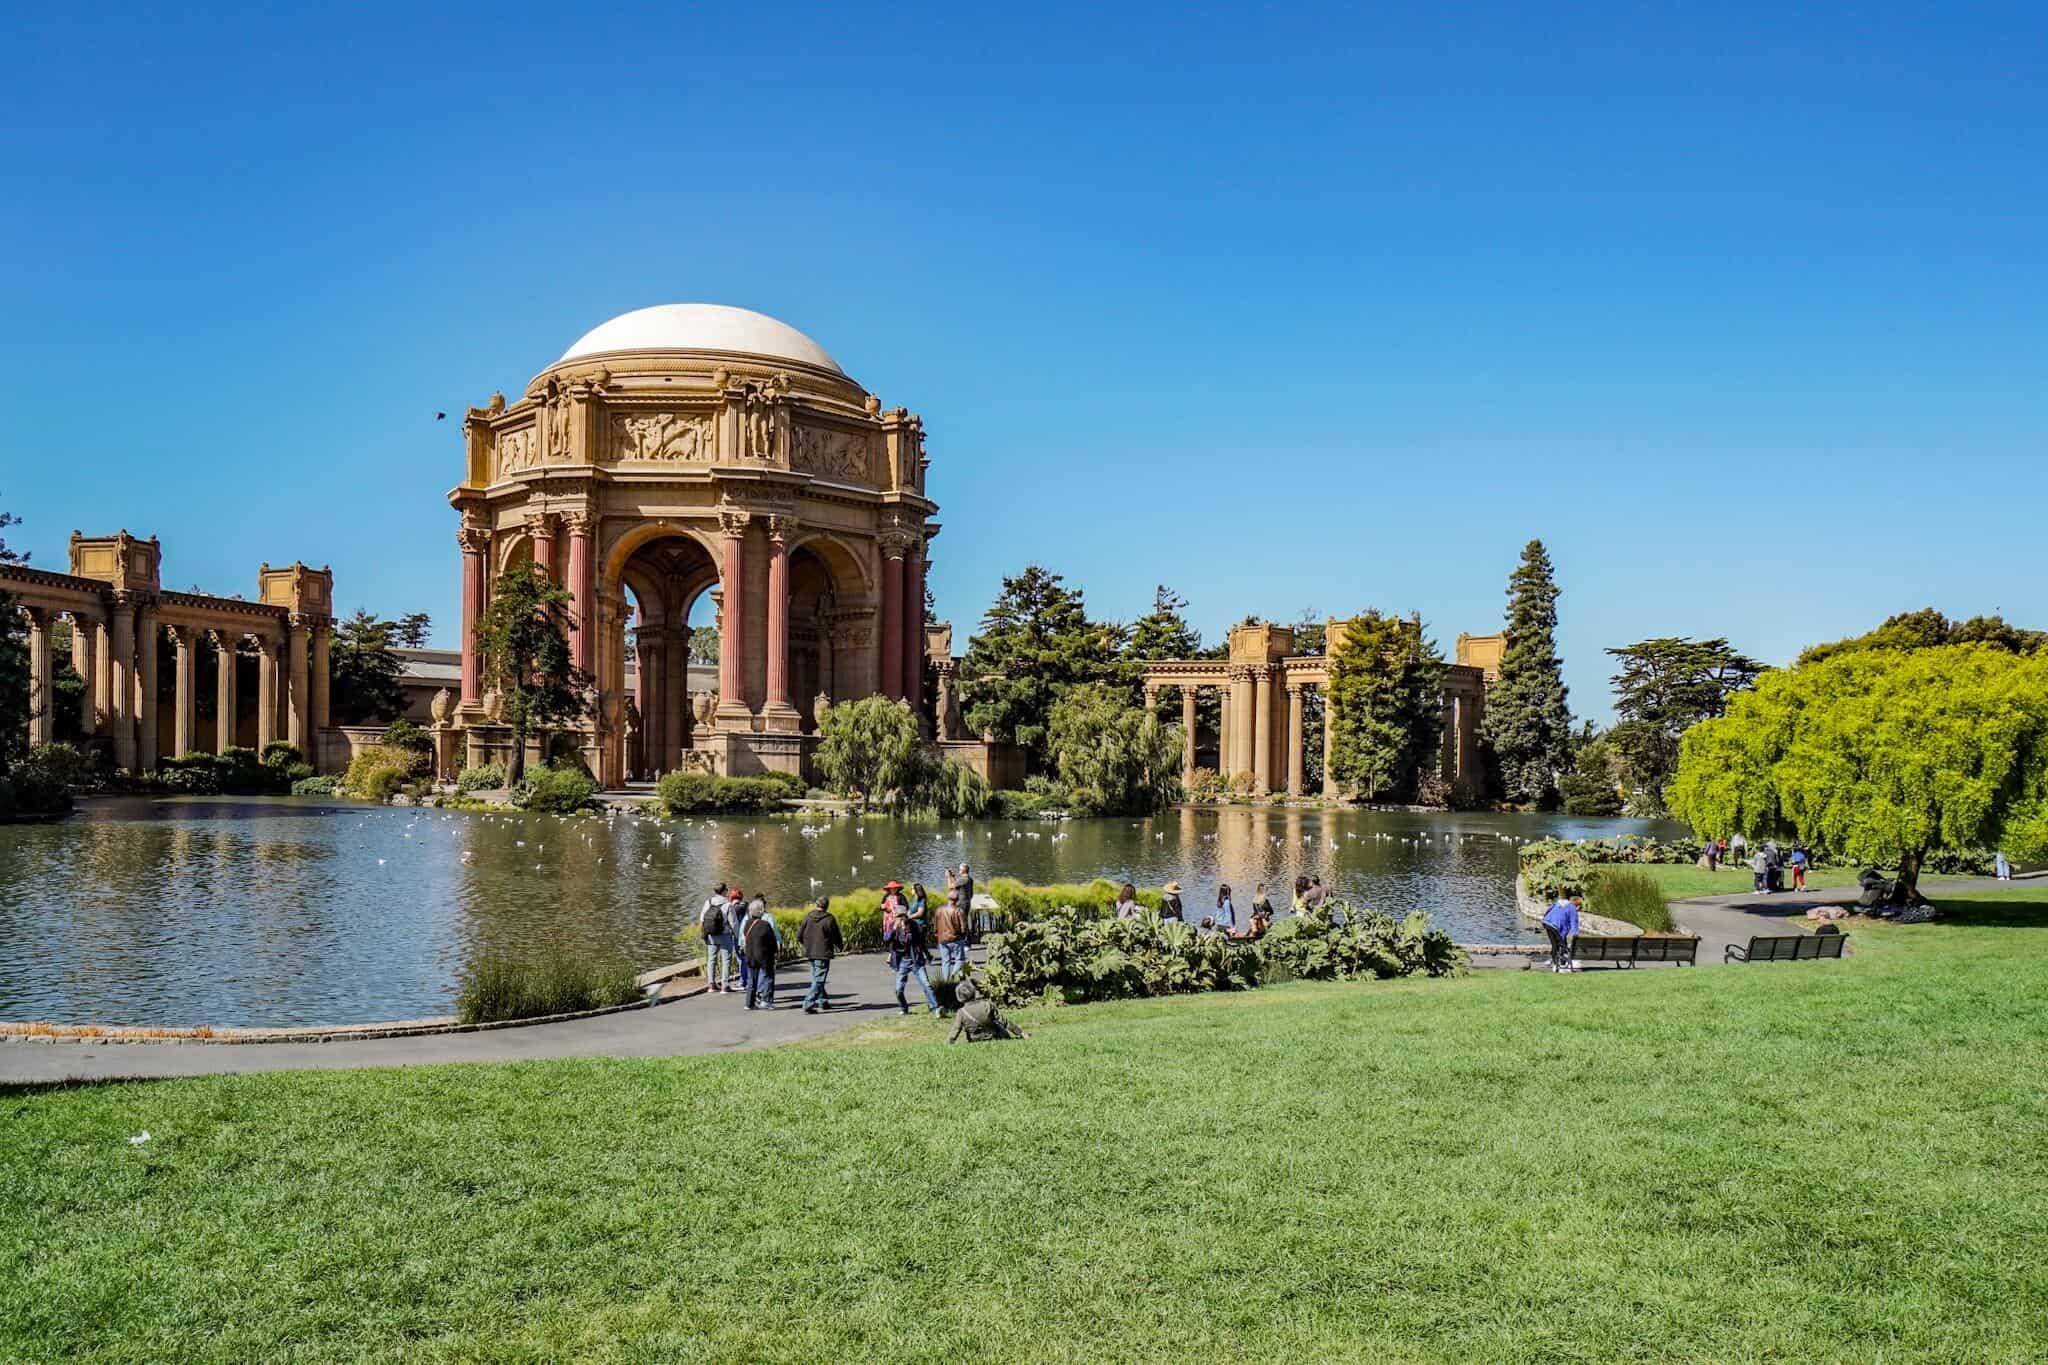 Museum of Fine Arts San Francisco